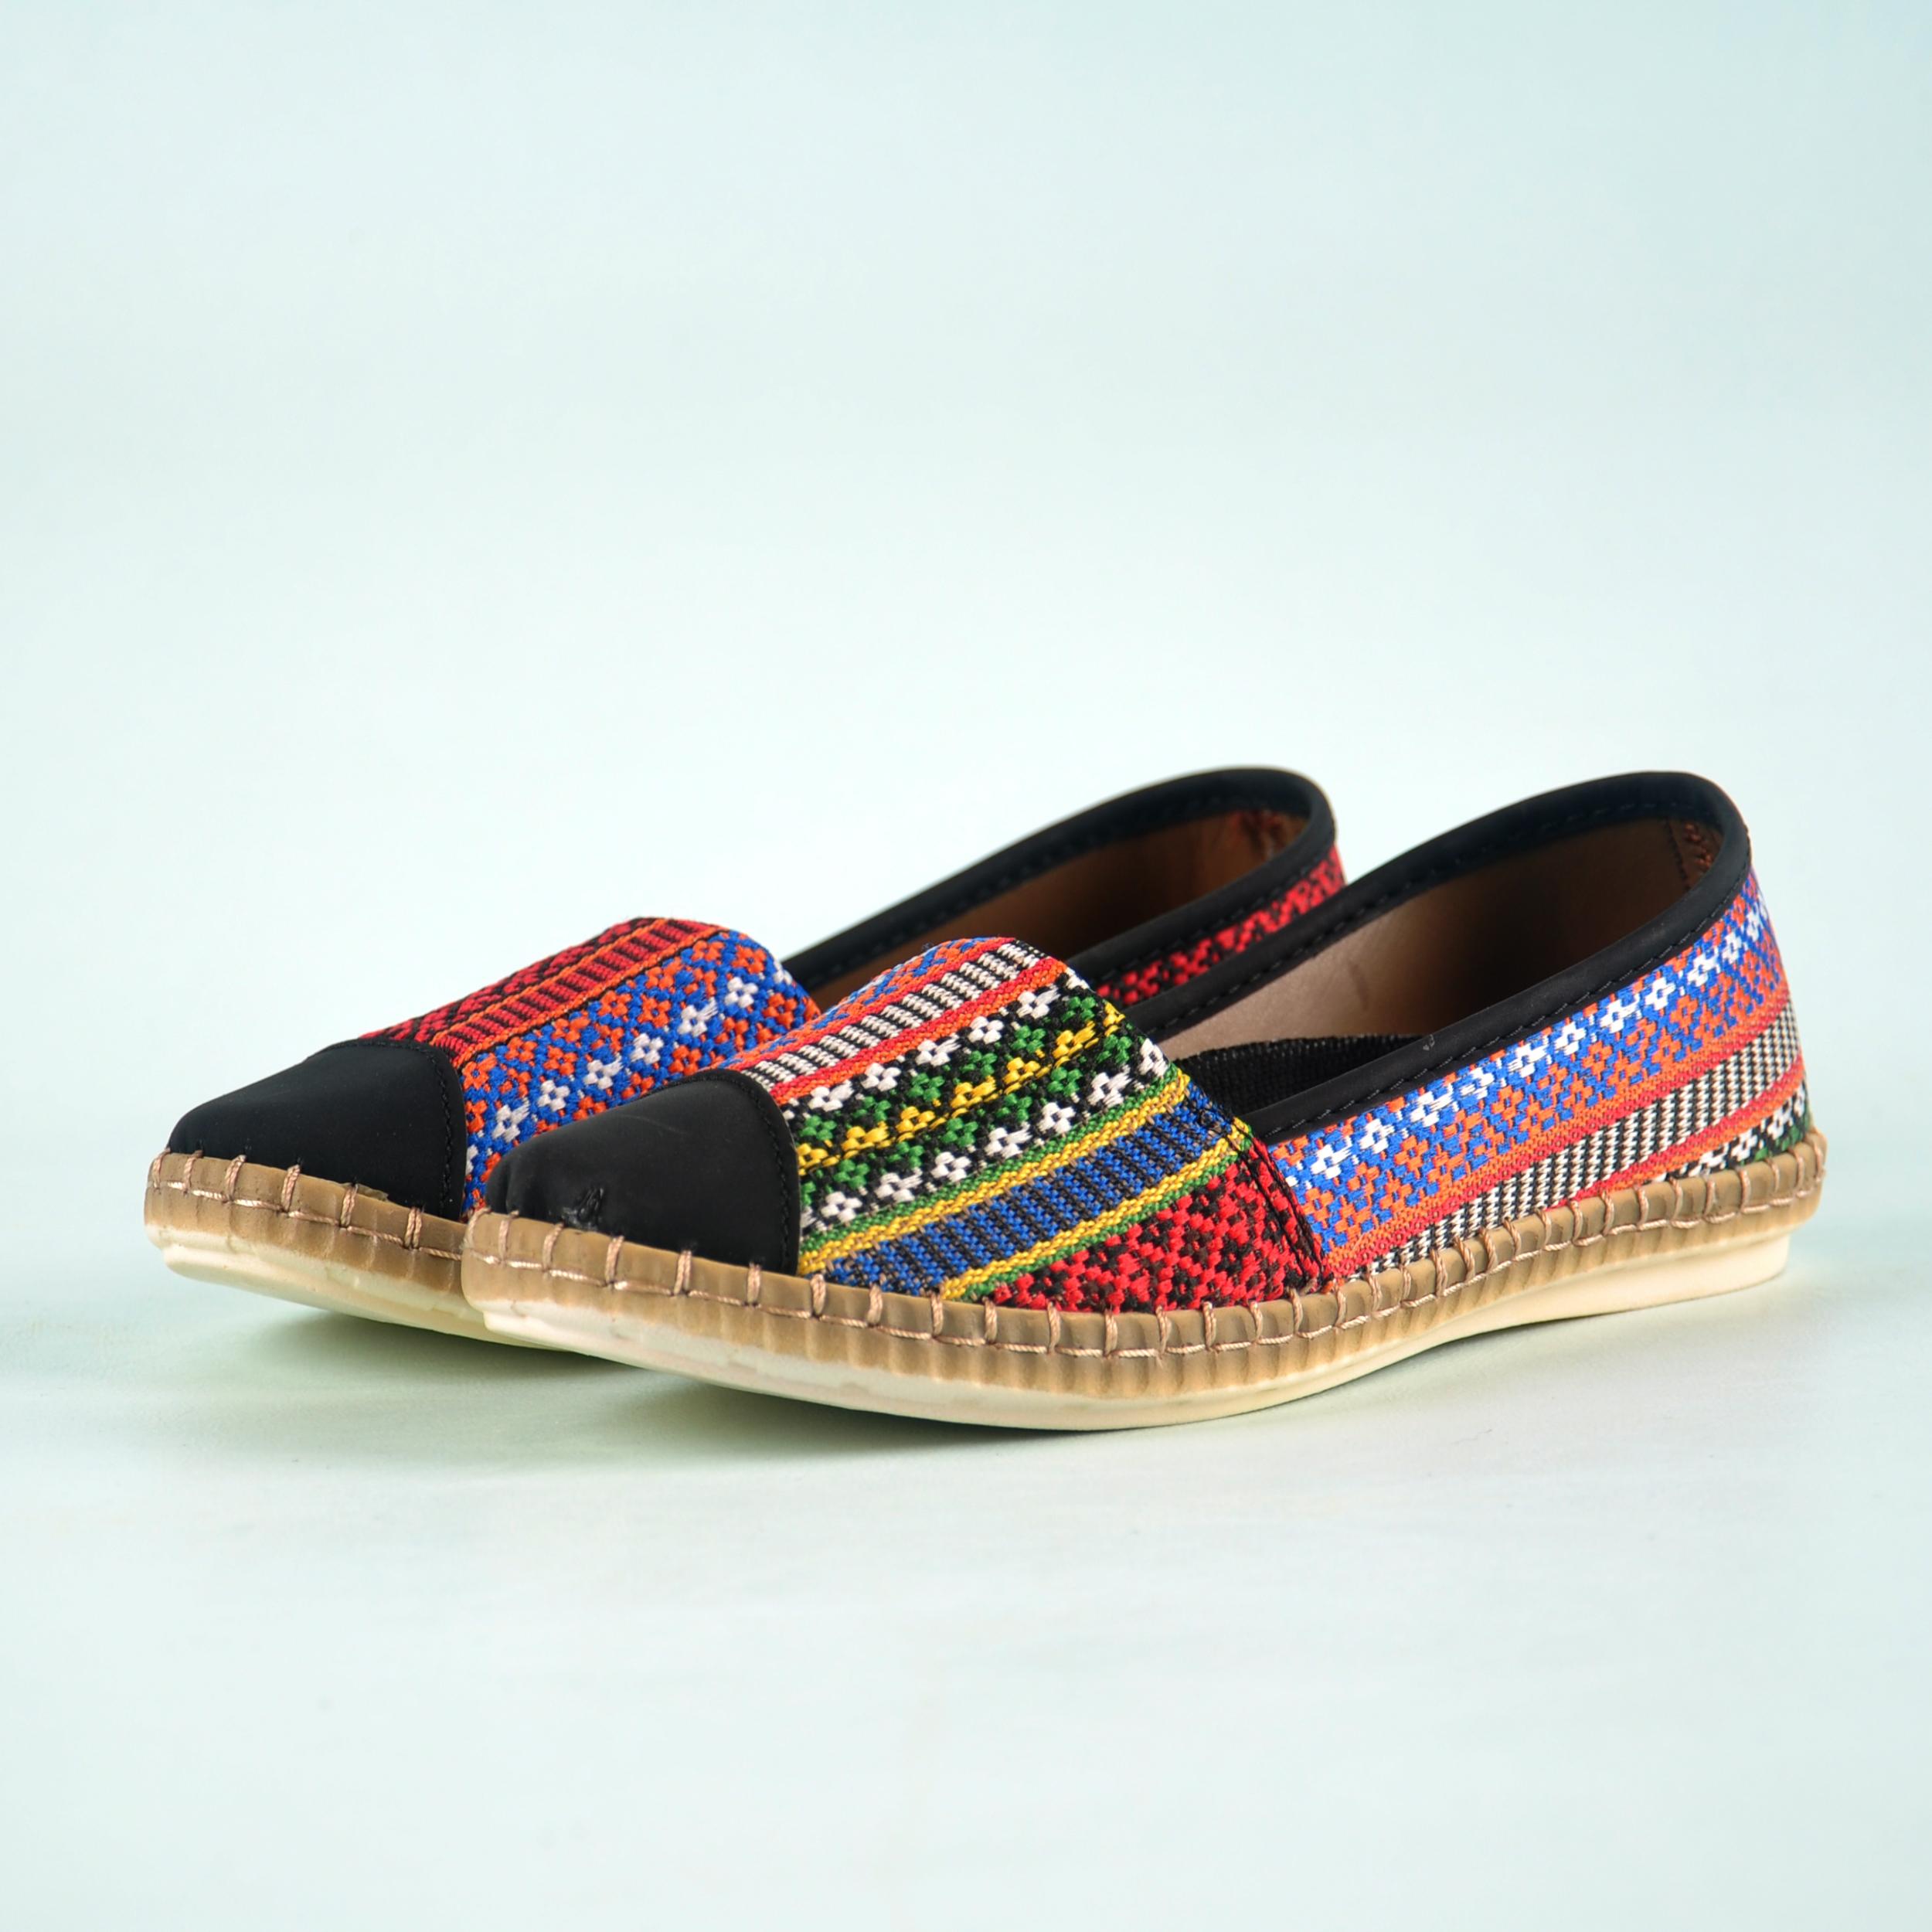 کفش روزمره زنانه طرح سنتی کد dh970 -  - 4